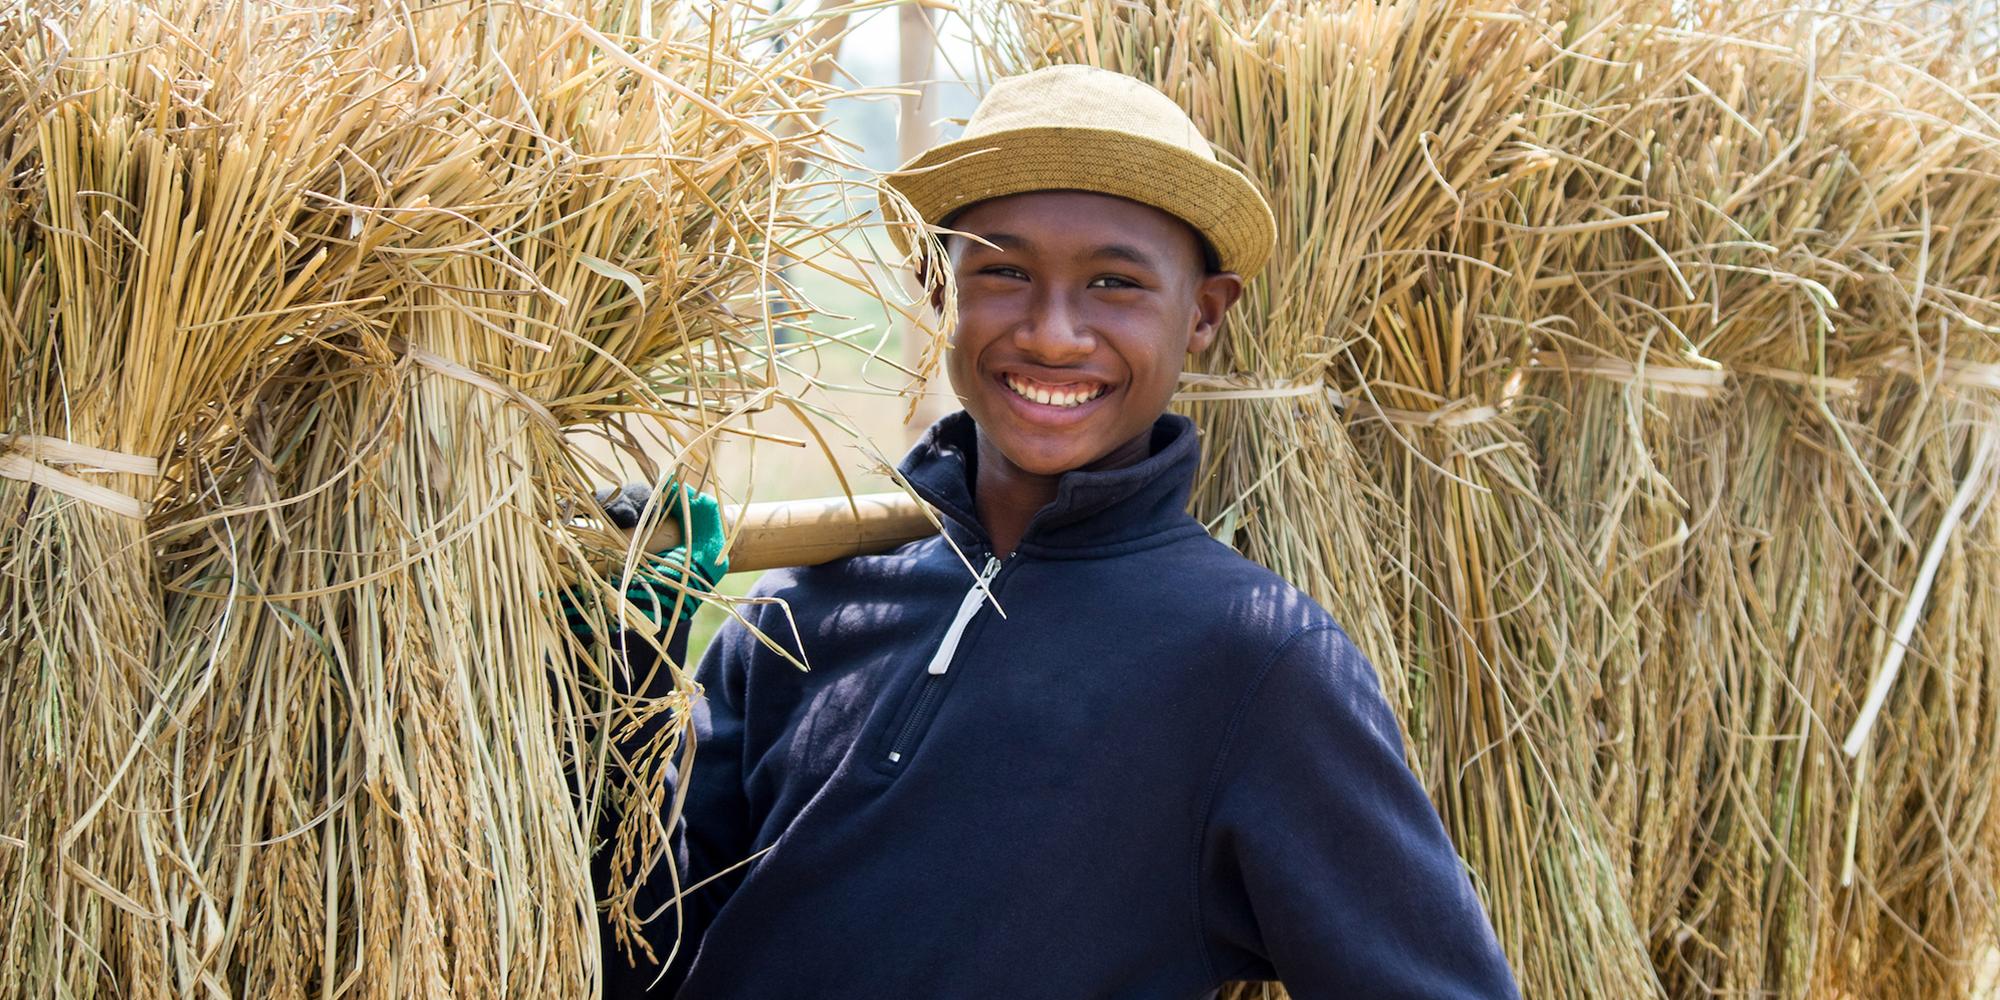 Ethiopia: Addis skills, Addis jobs - PerspActive NGO